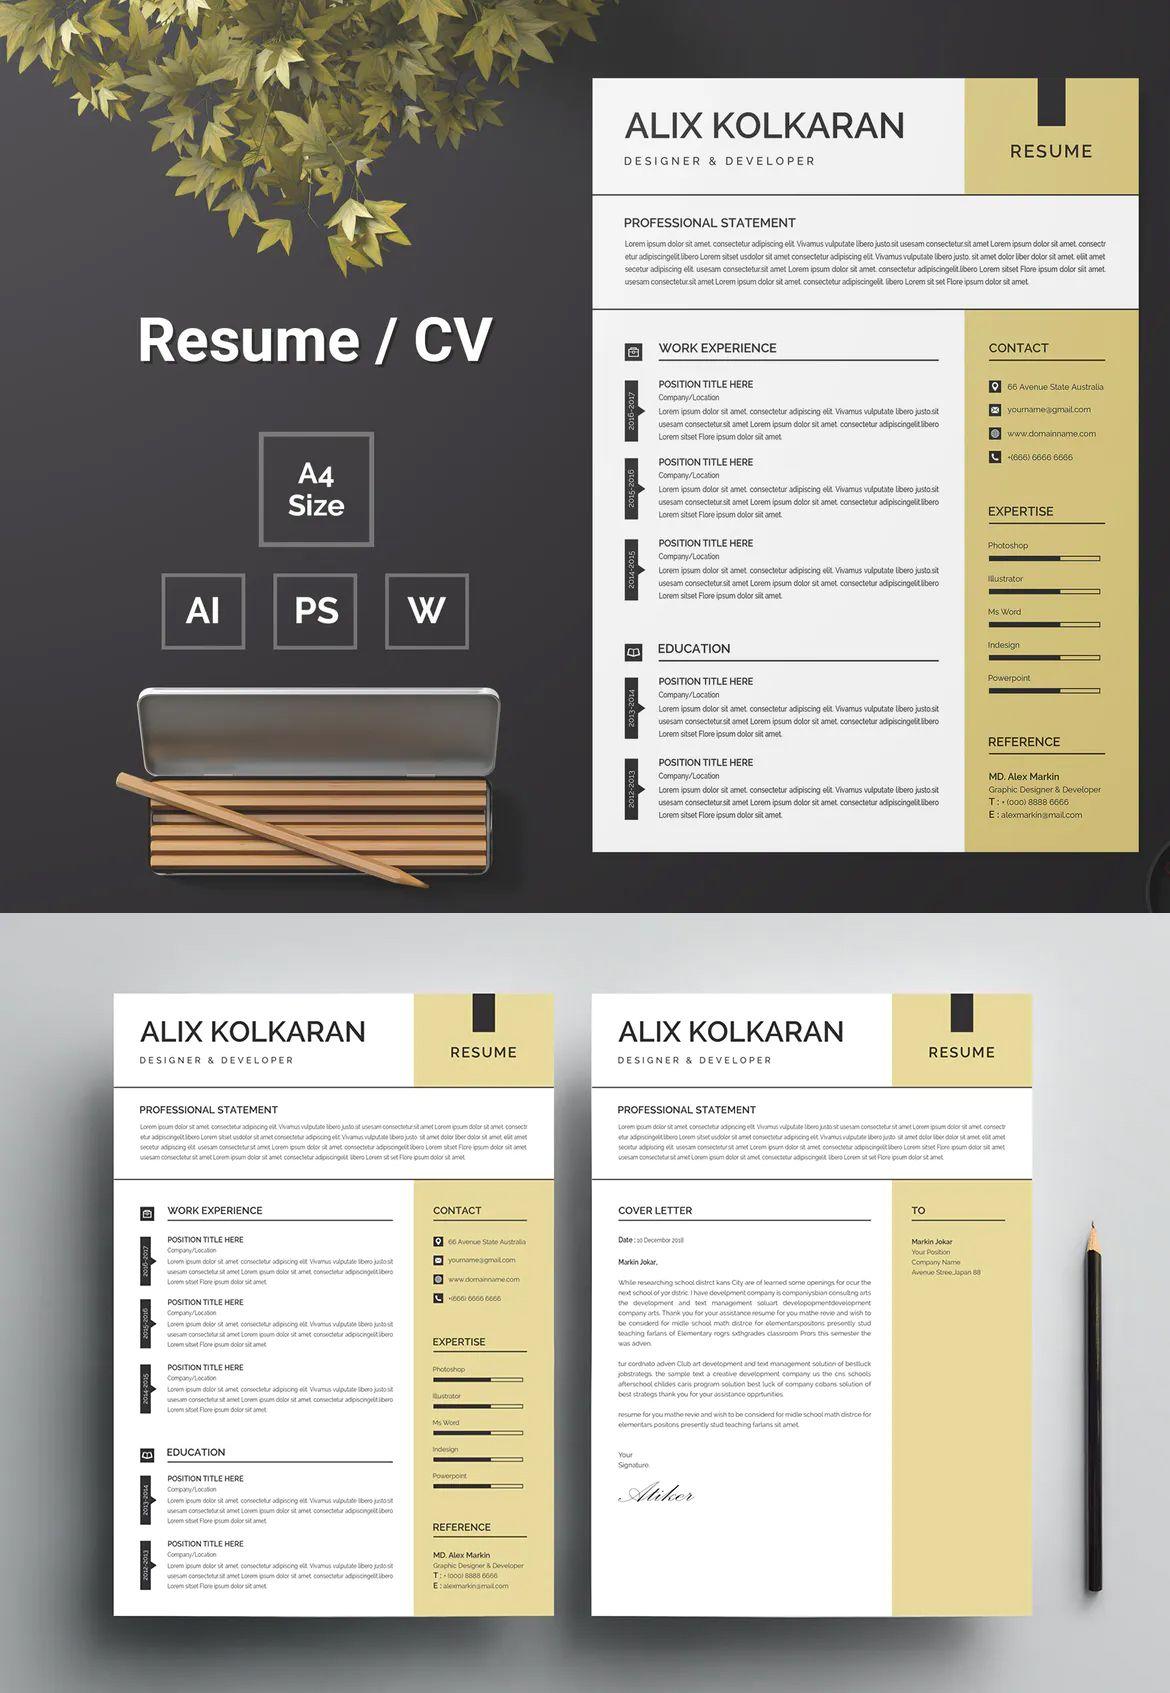 Resume Template 99 by bdthemes on Resume, Cv design